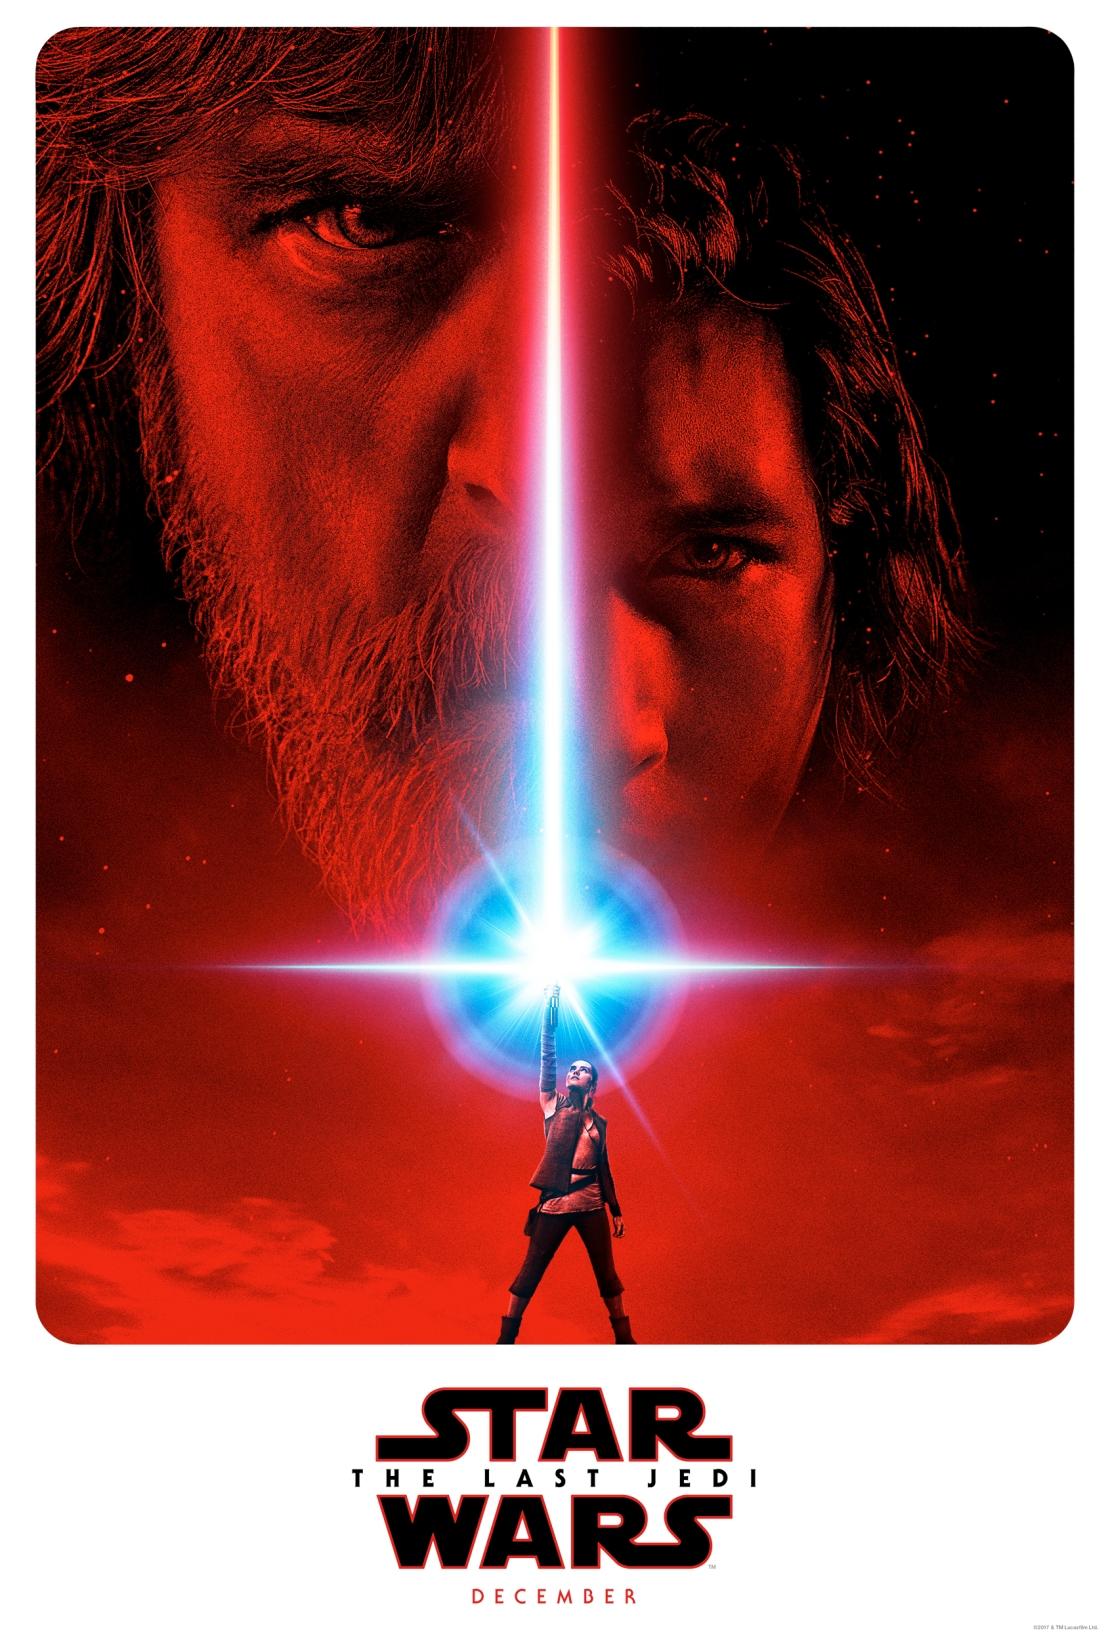 Star Wars Episode VIII: The Last Jedi.